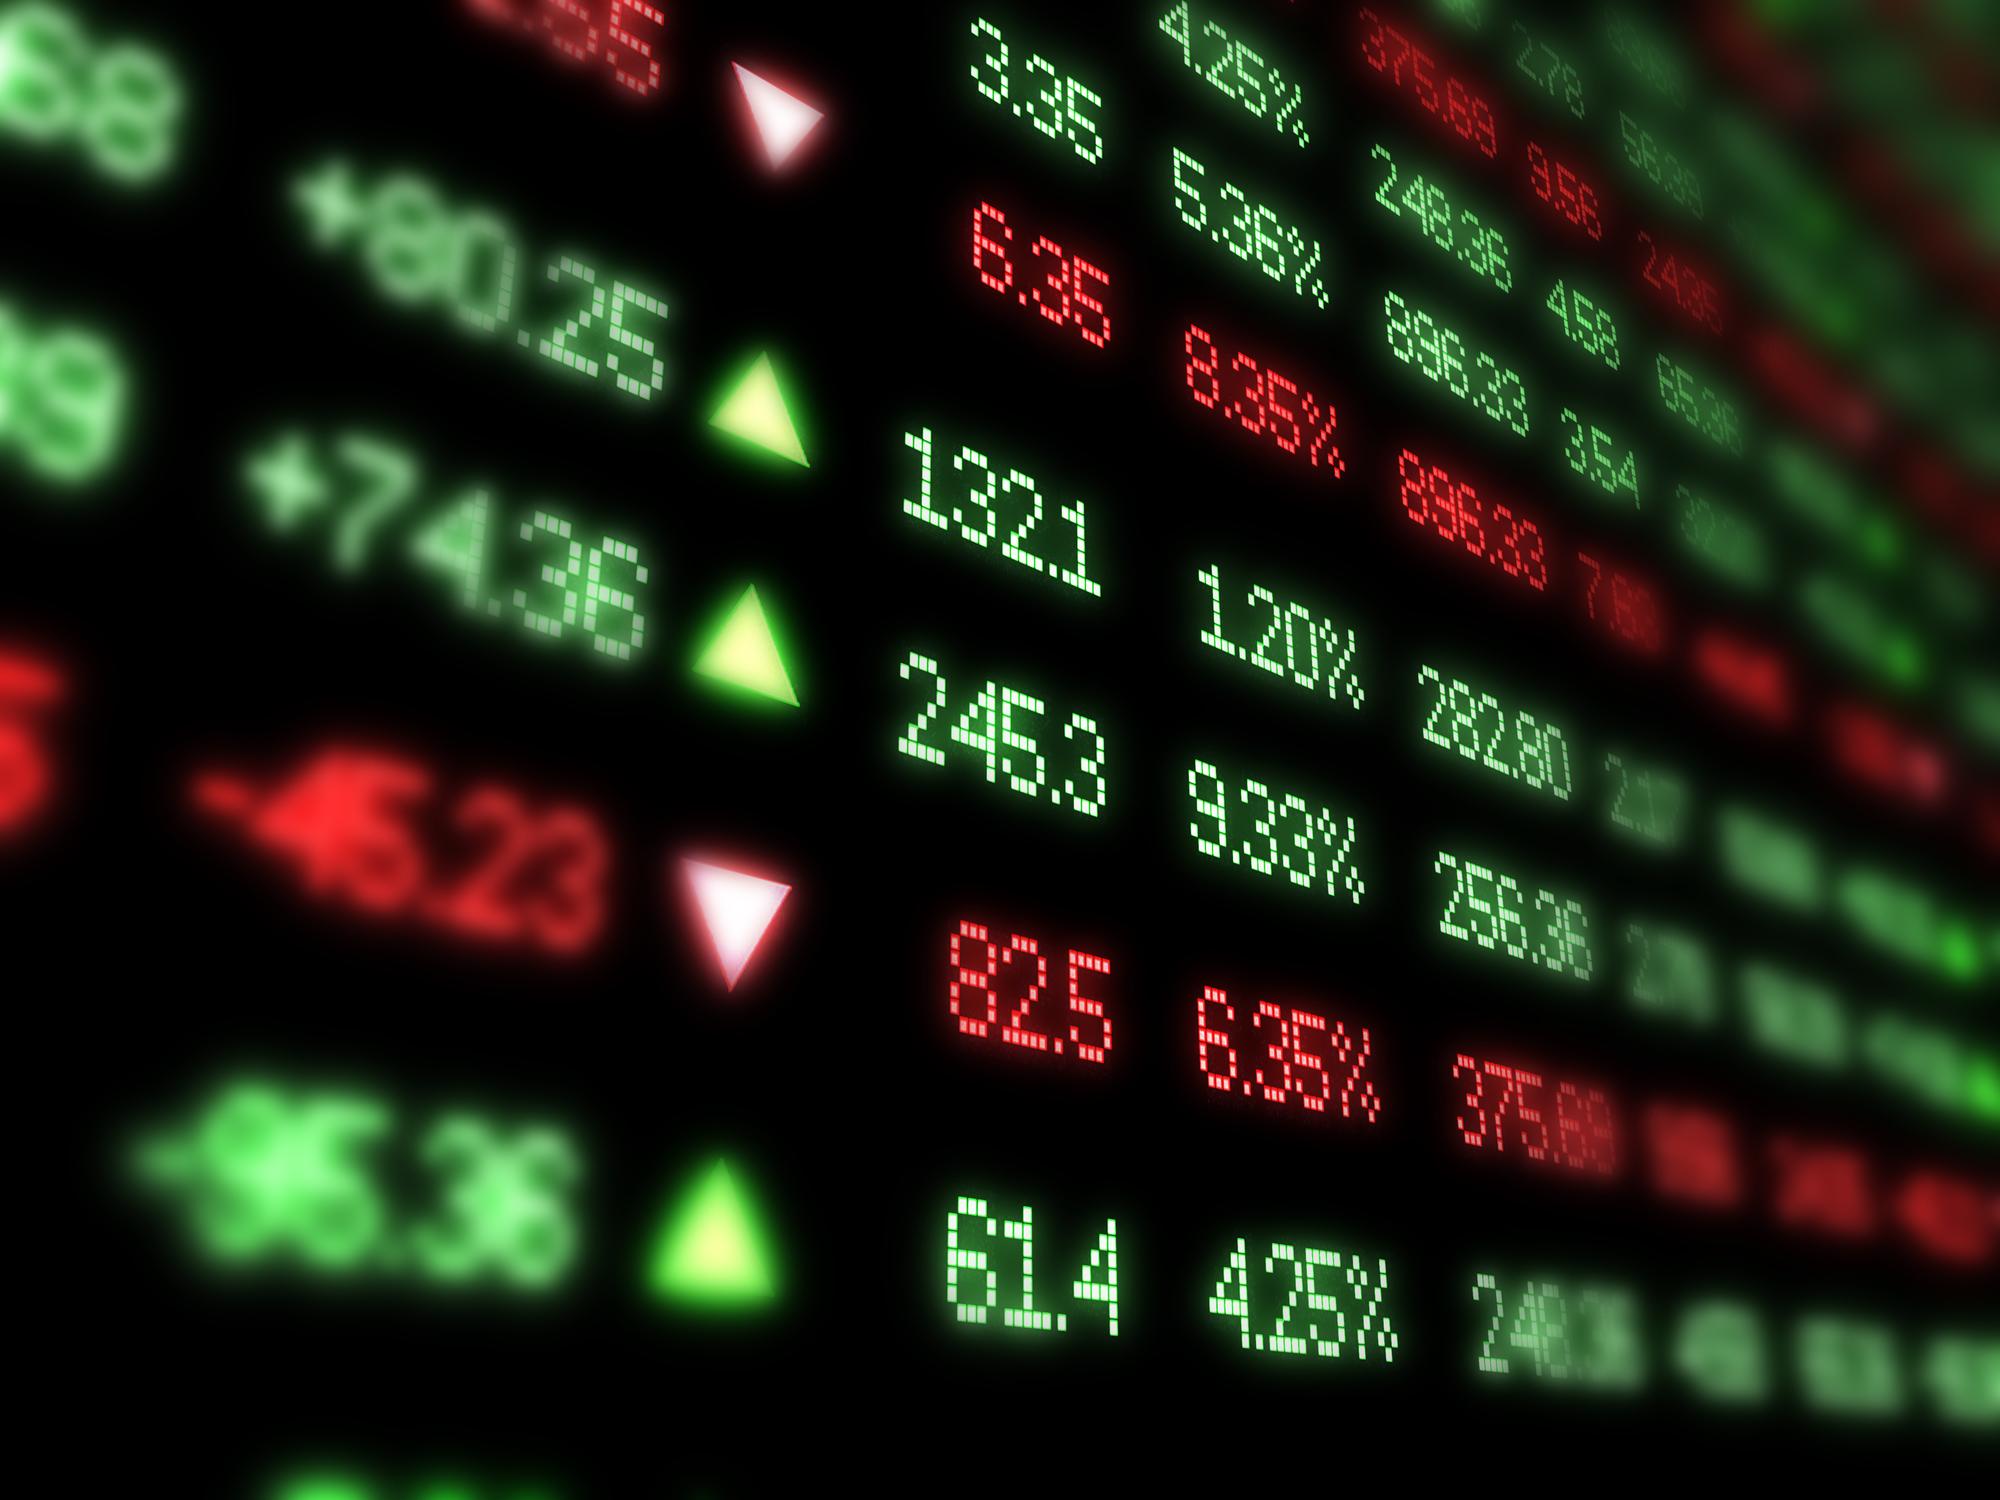 stock market image getty